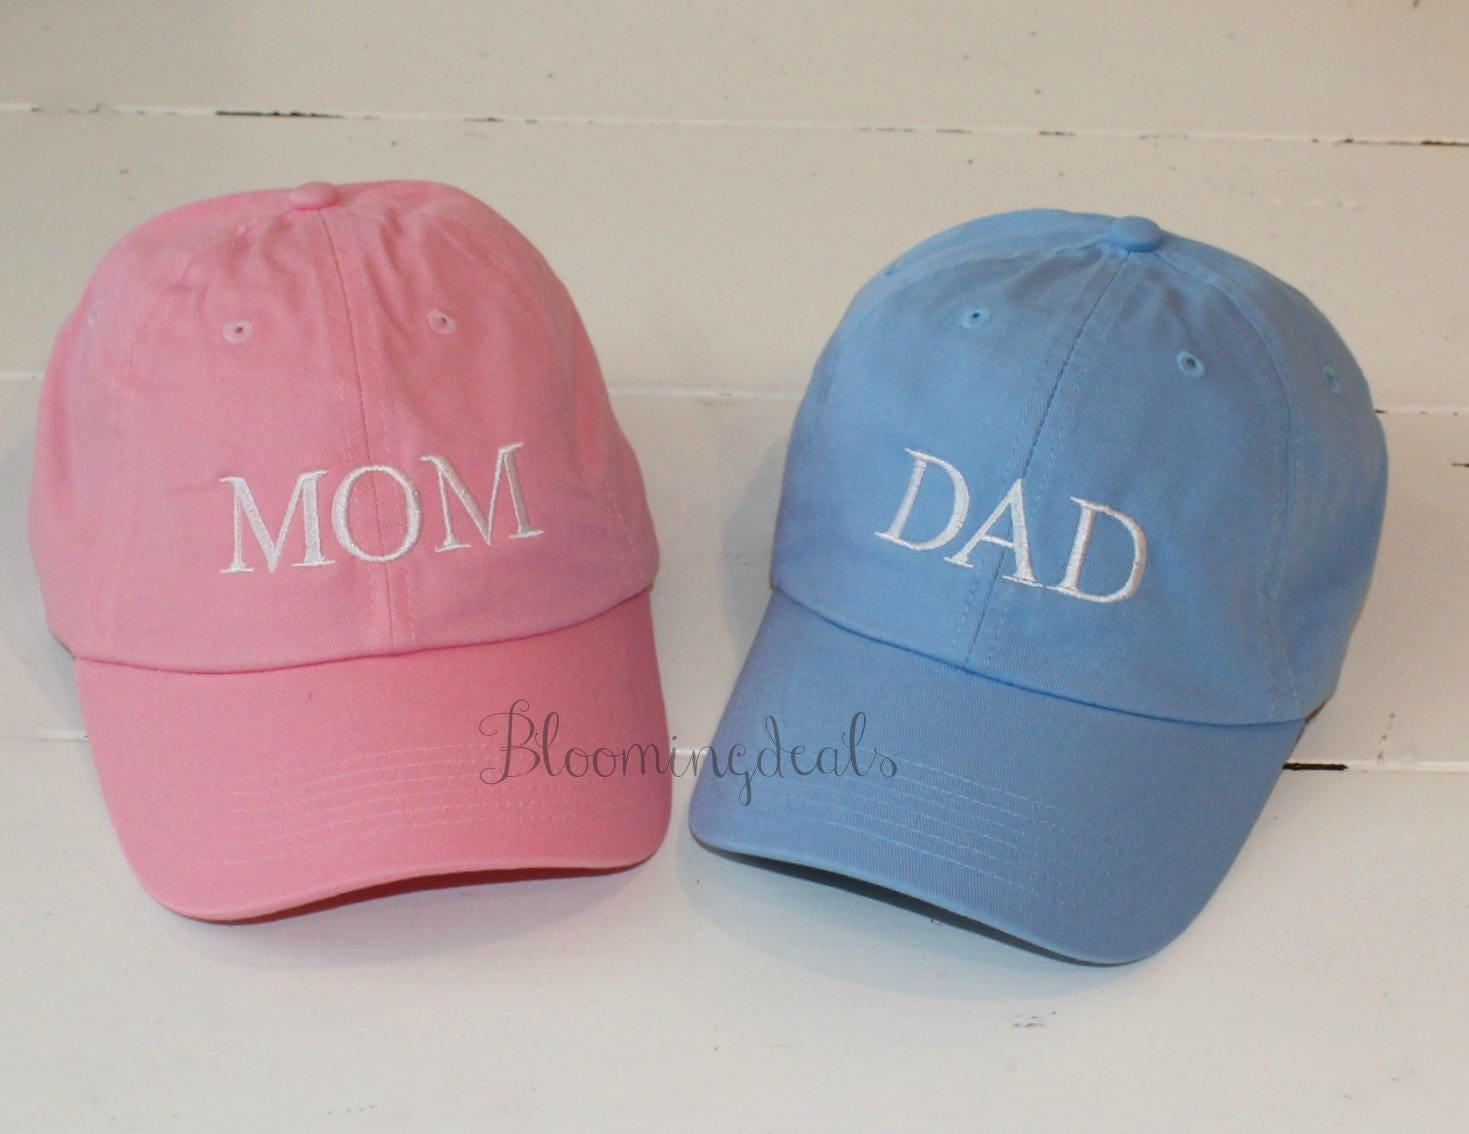 f6fd0e57a11 MOM and DAD Pregnancy Announcement Baseball Caps Big Brother